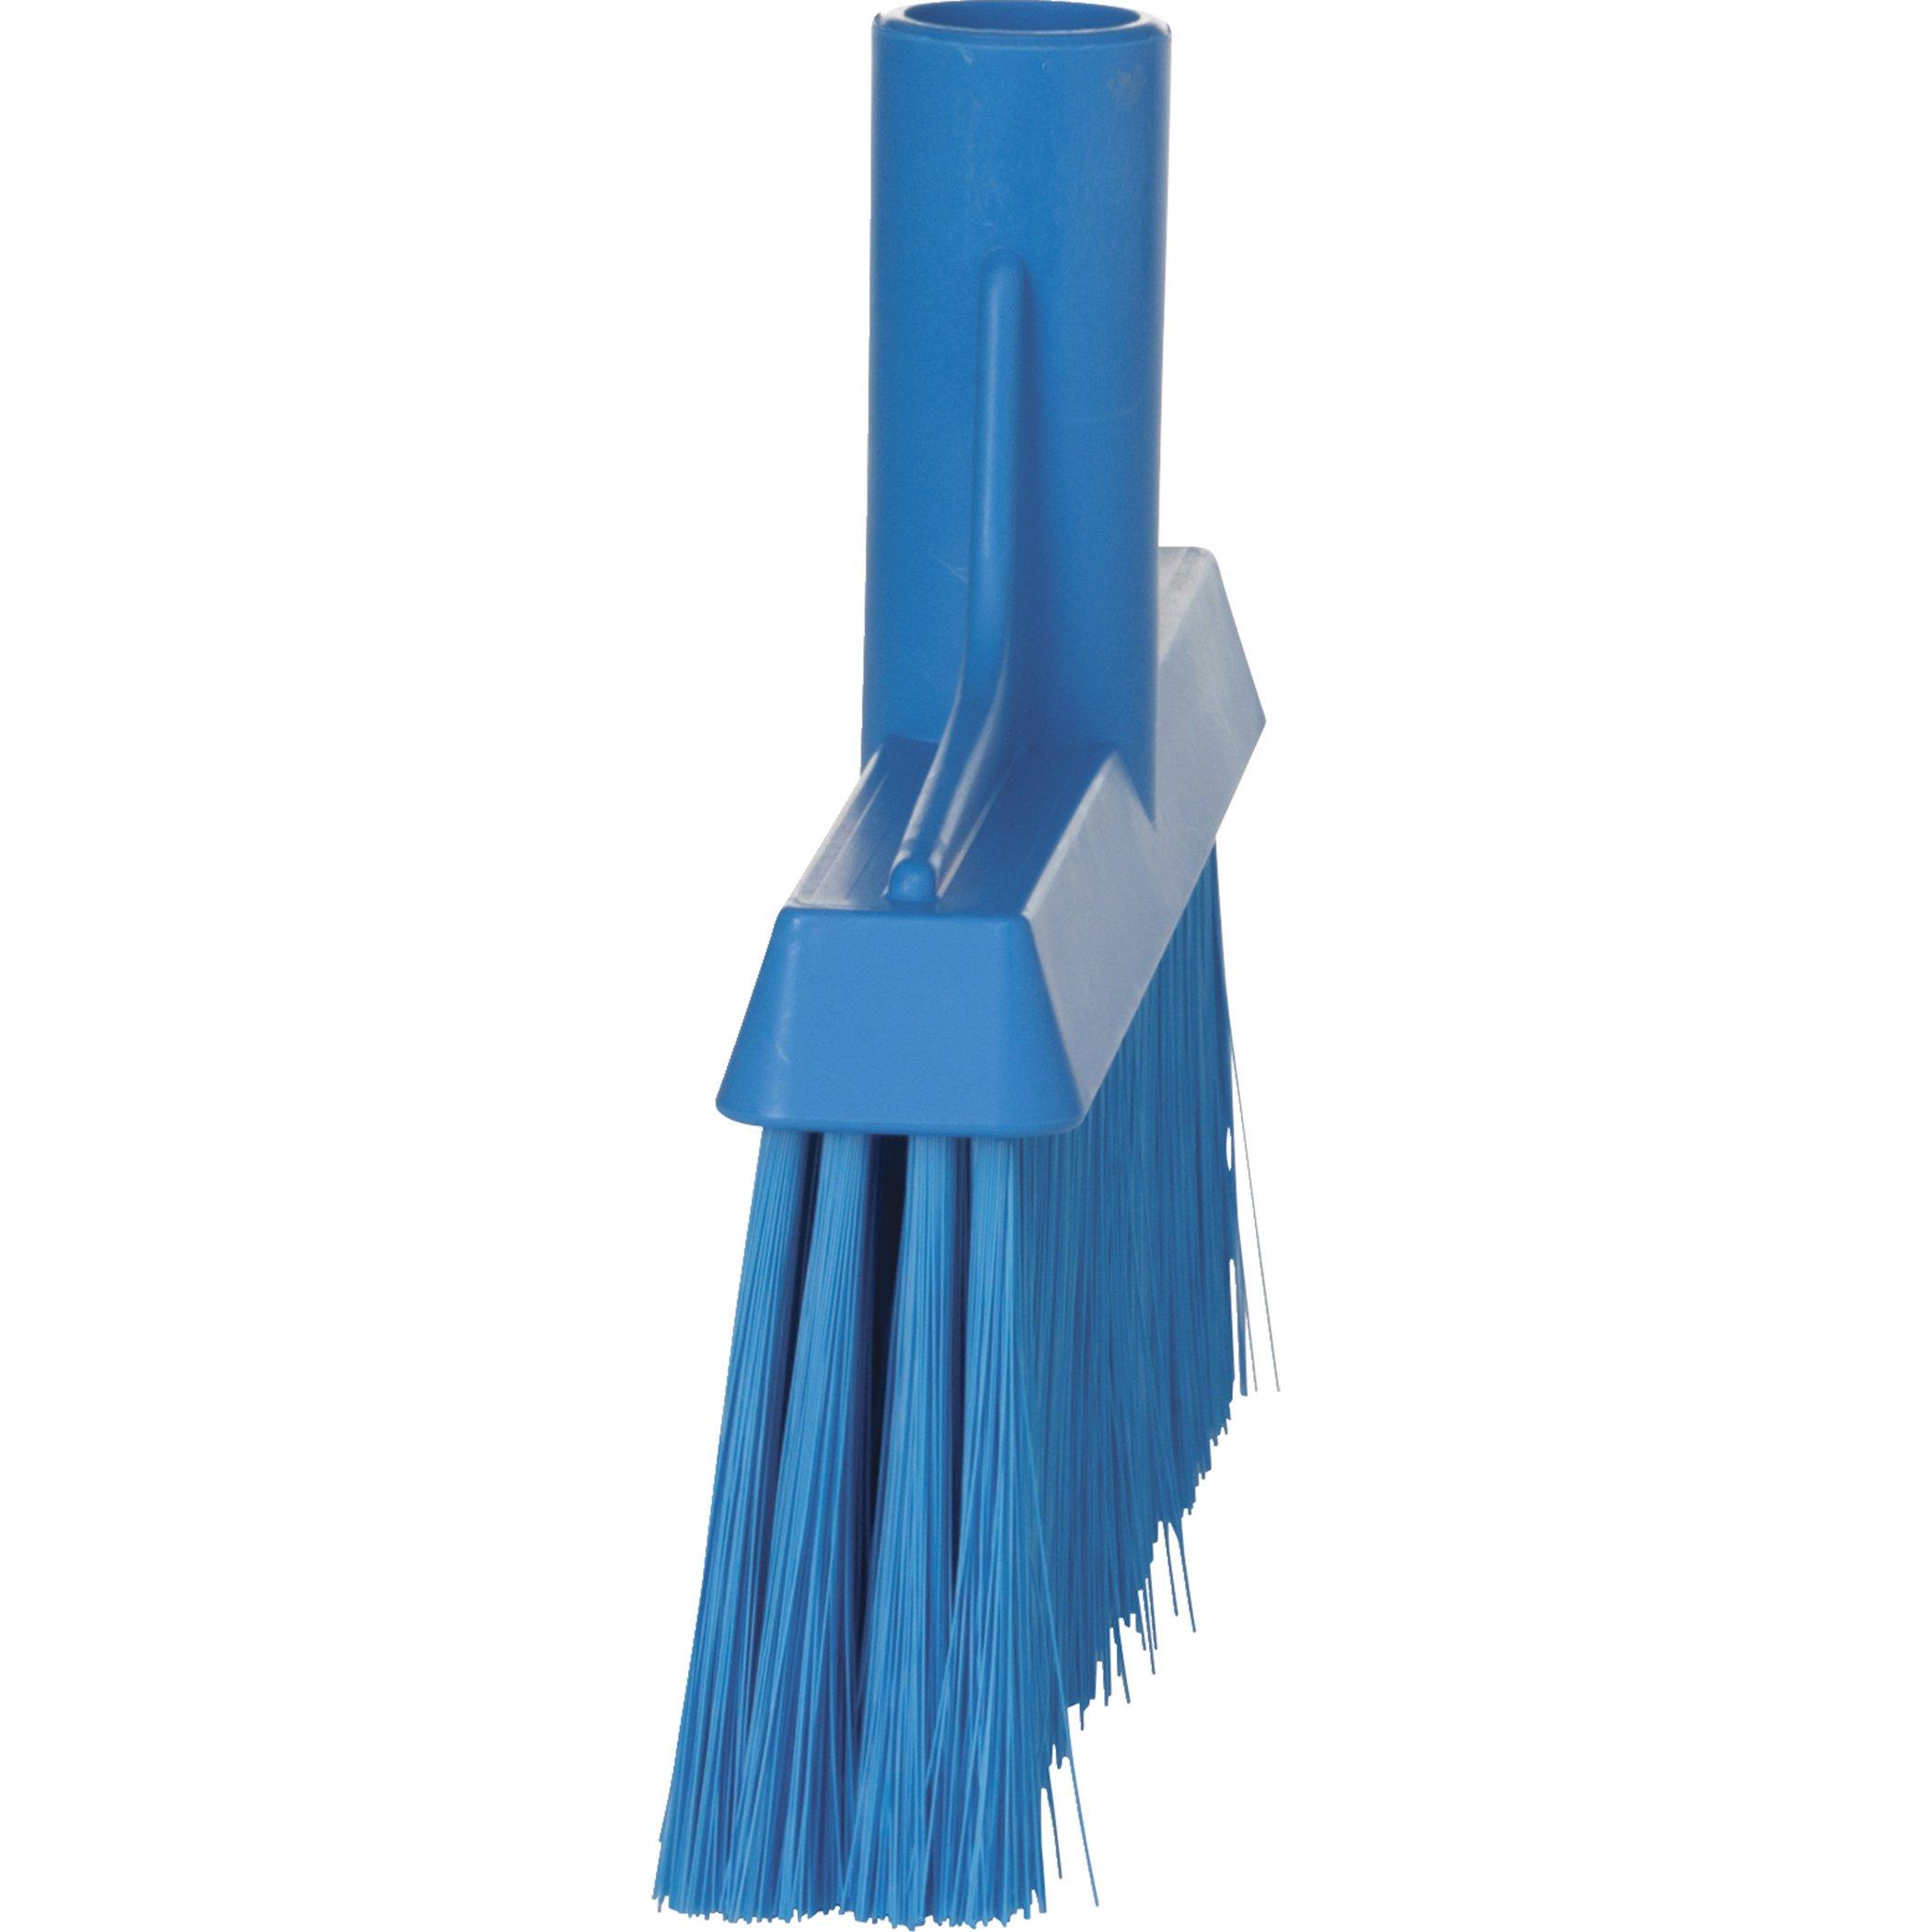 VIKAN 10-1/4'' Polyester Heavy Duty Floor Broom Head